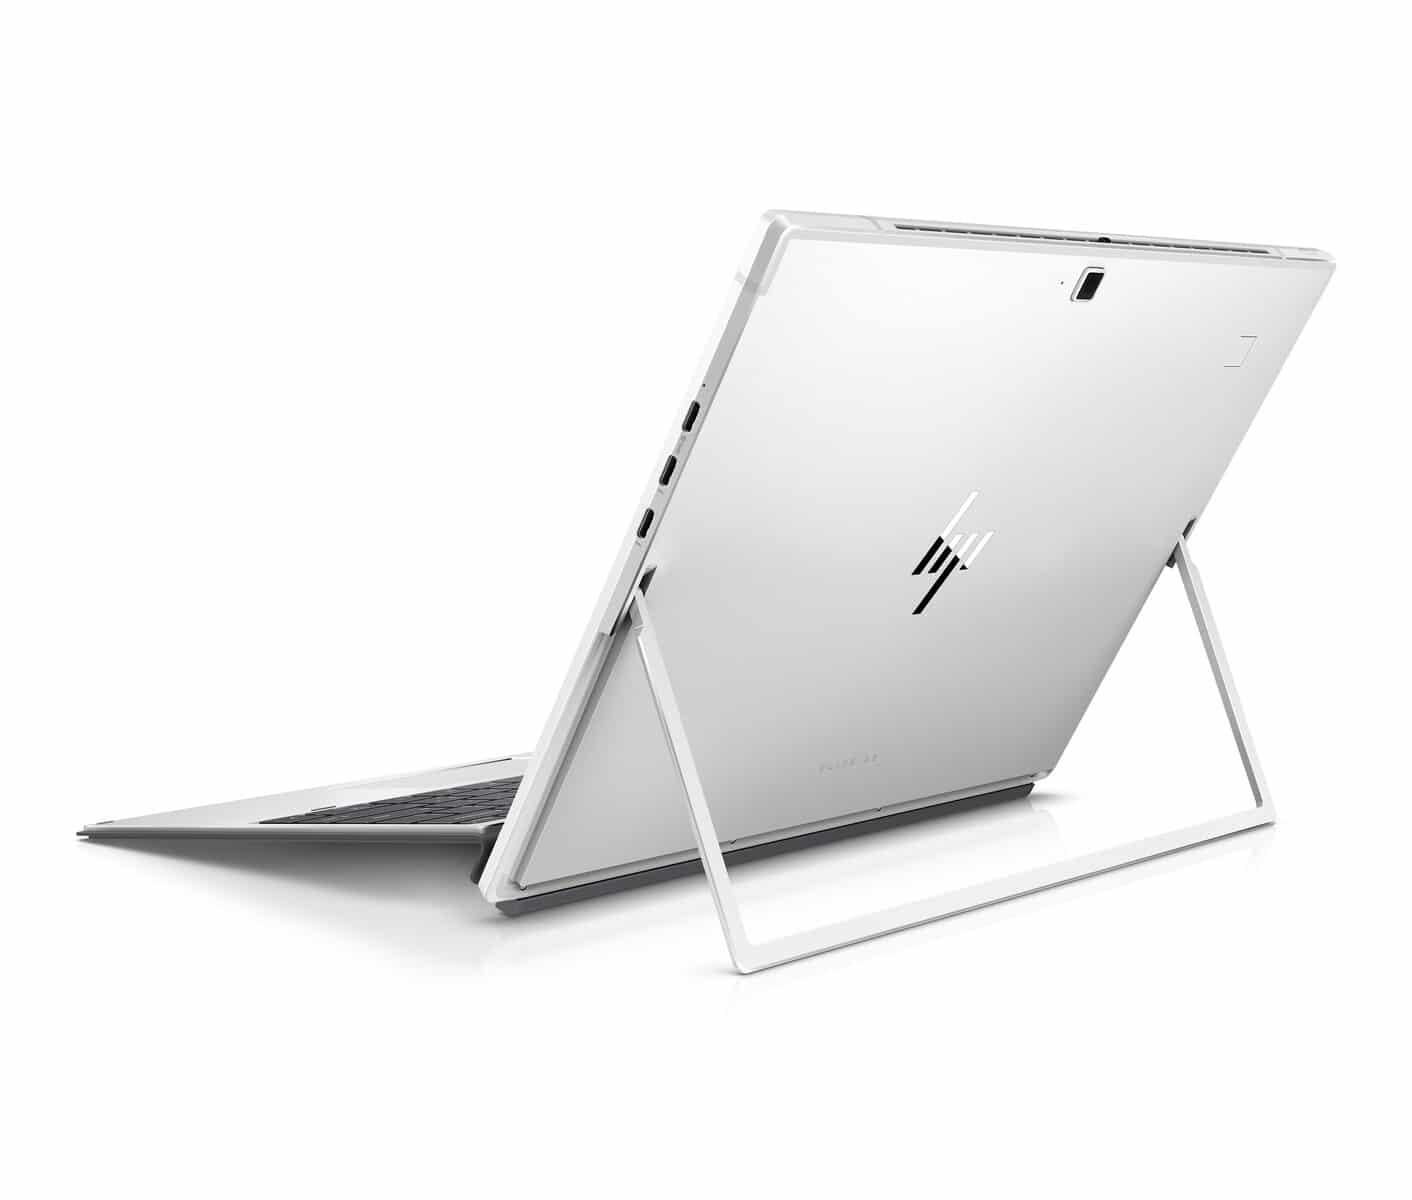 "HP Elite x2 G4, Ultrabook 13""/Tablette Quad Core 4G, Thunderbolt Wi-Fi ax"